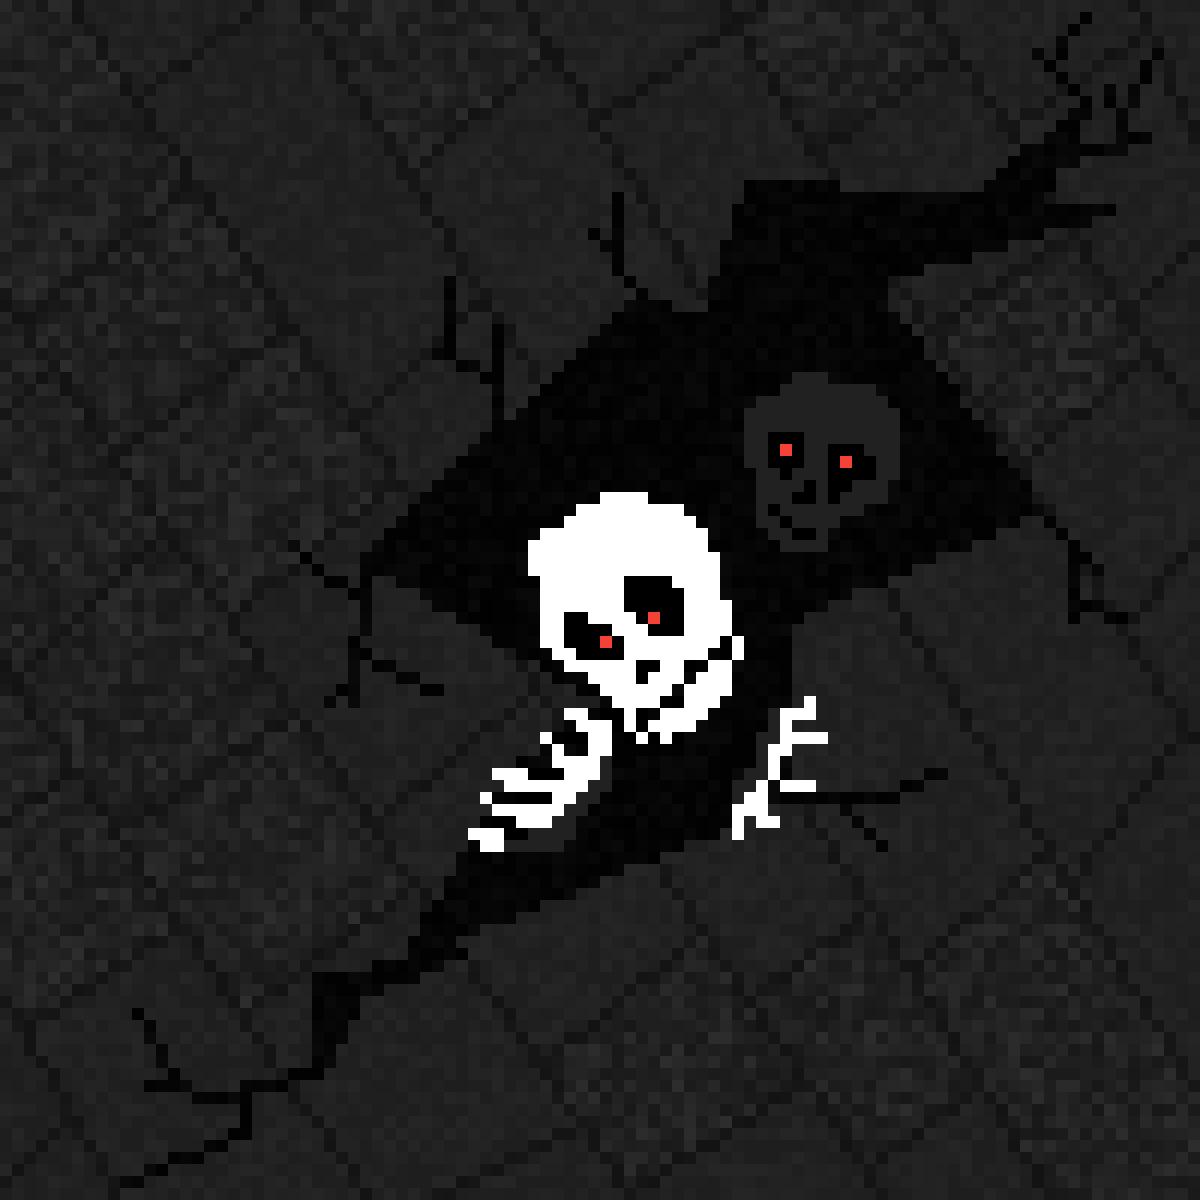 Skeletons by FlyingTk